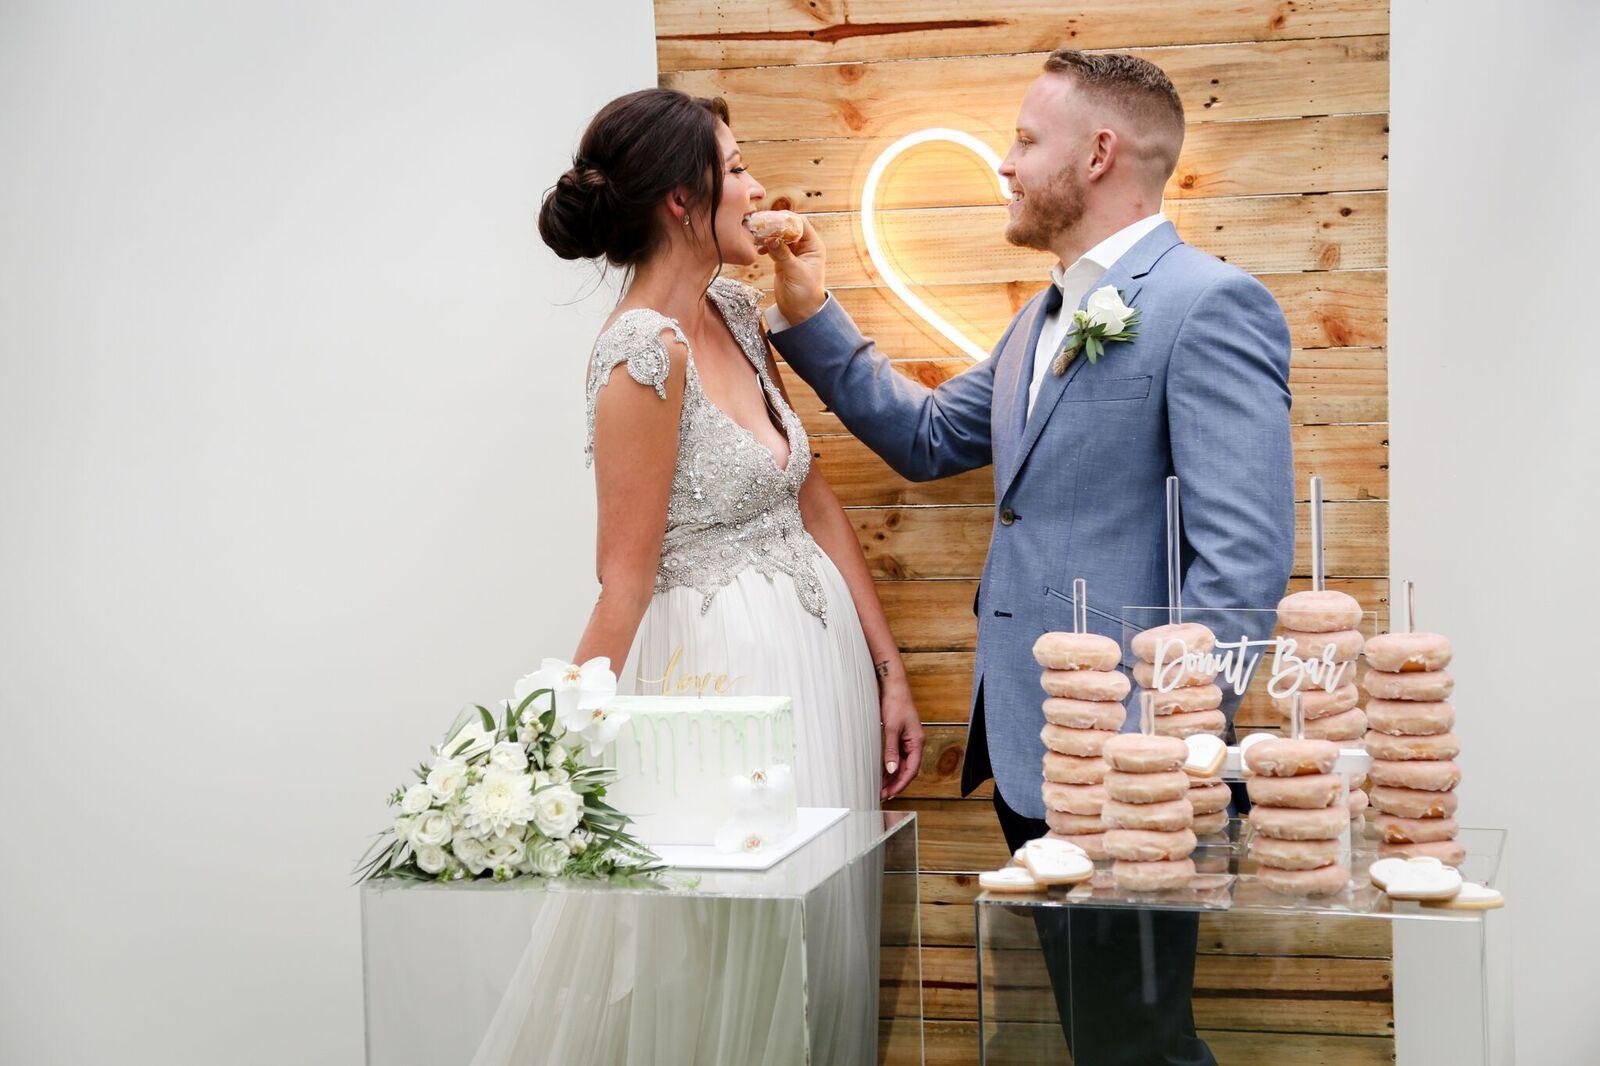 STYLED: LITTLE GINGER CO | WAREHOUSE WEDDING INSPIRATION MELBOURNE VIC